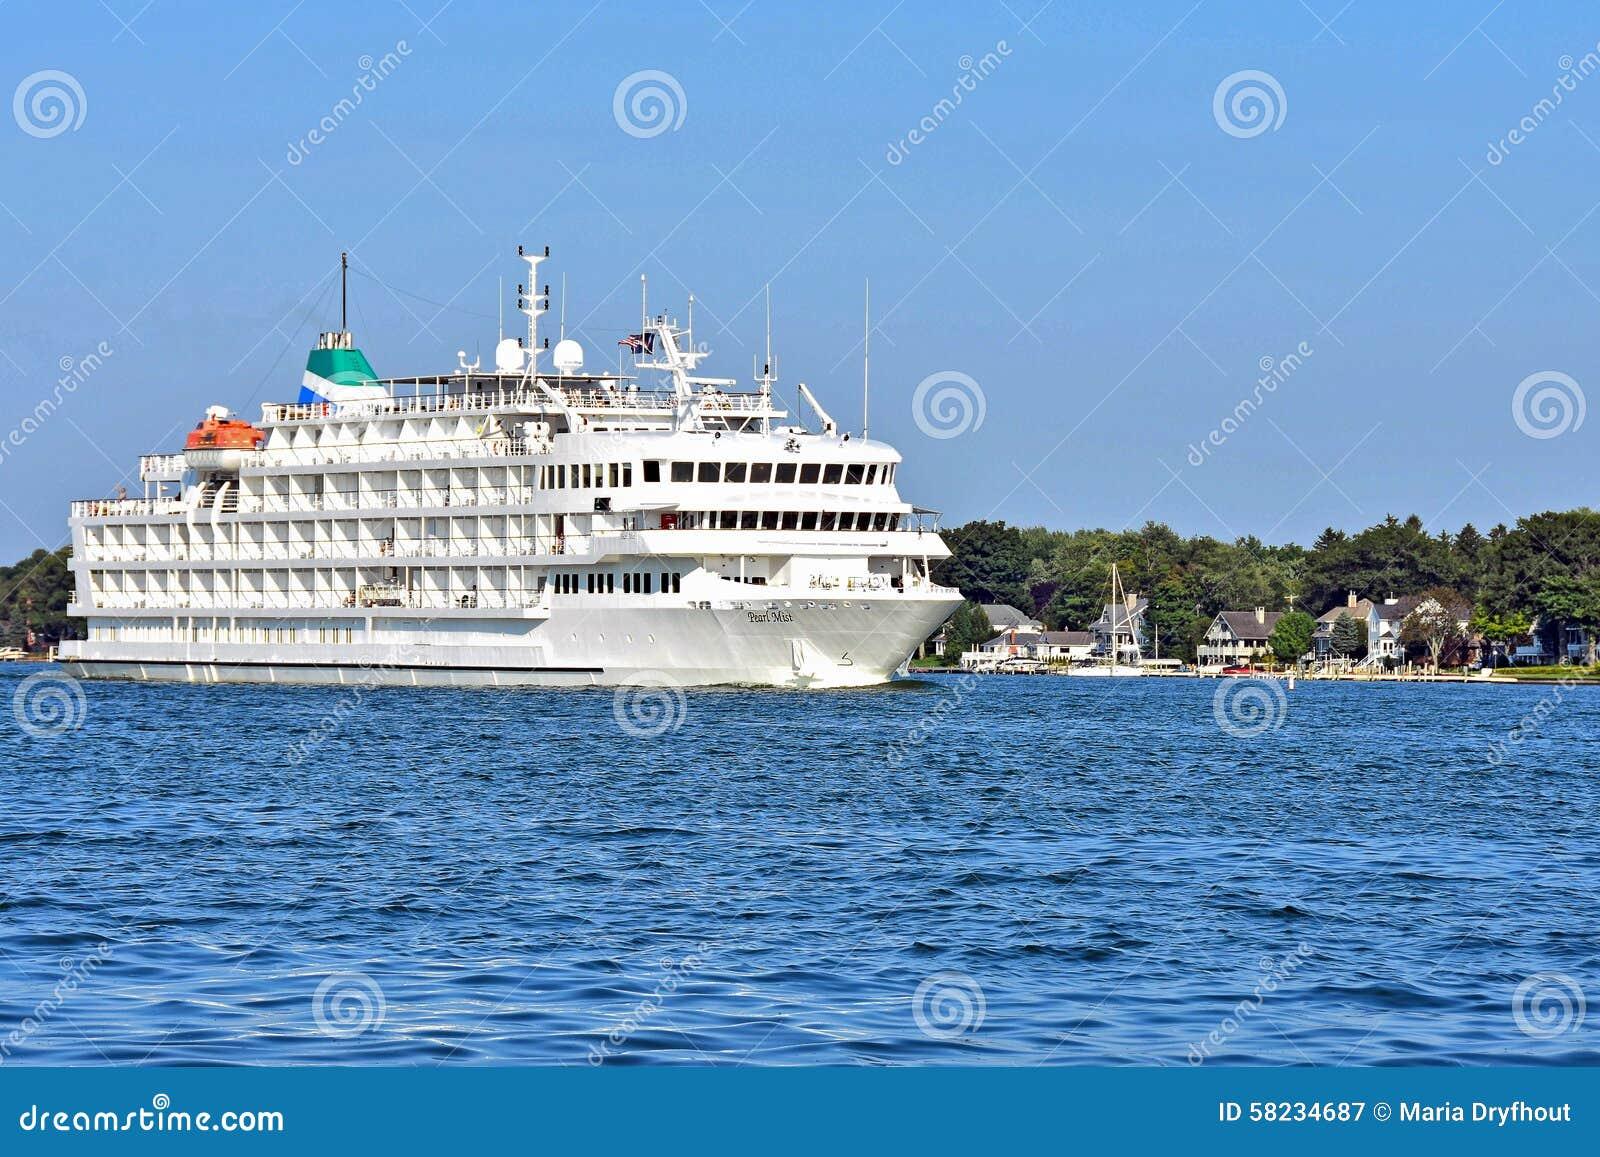 Luxury Great Lakes Cruise Ship In Michigan Editorial ...